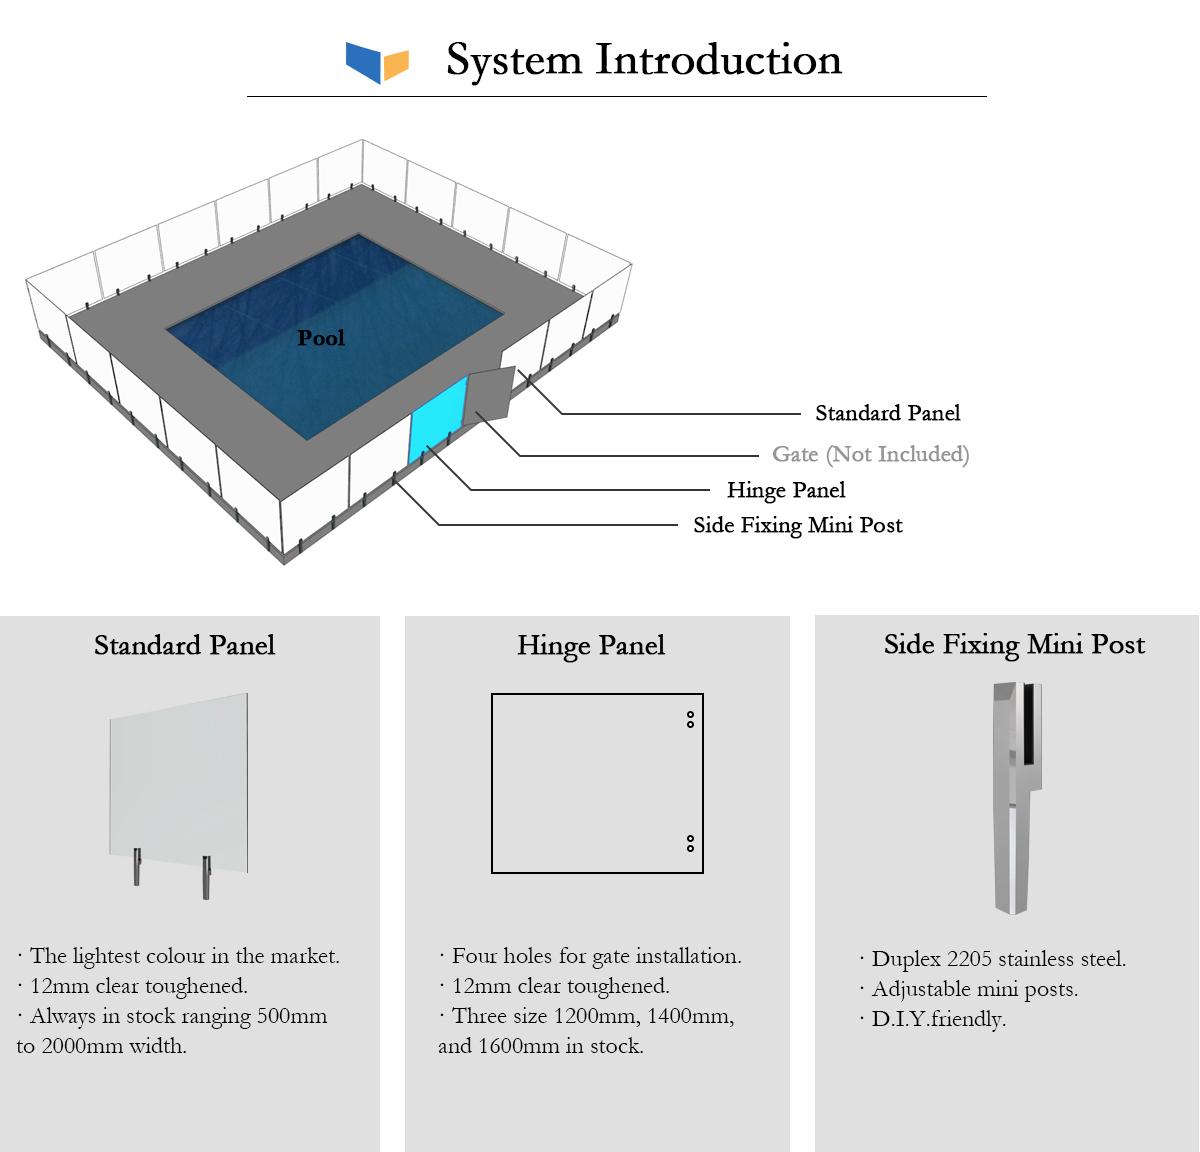 sfmp-introduction-revised.jpg